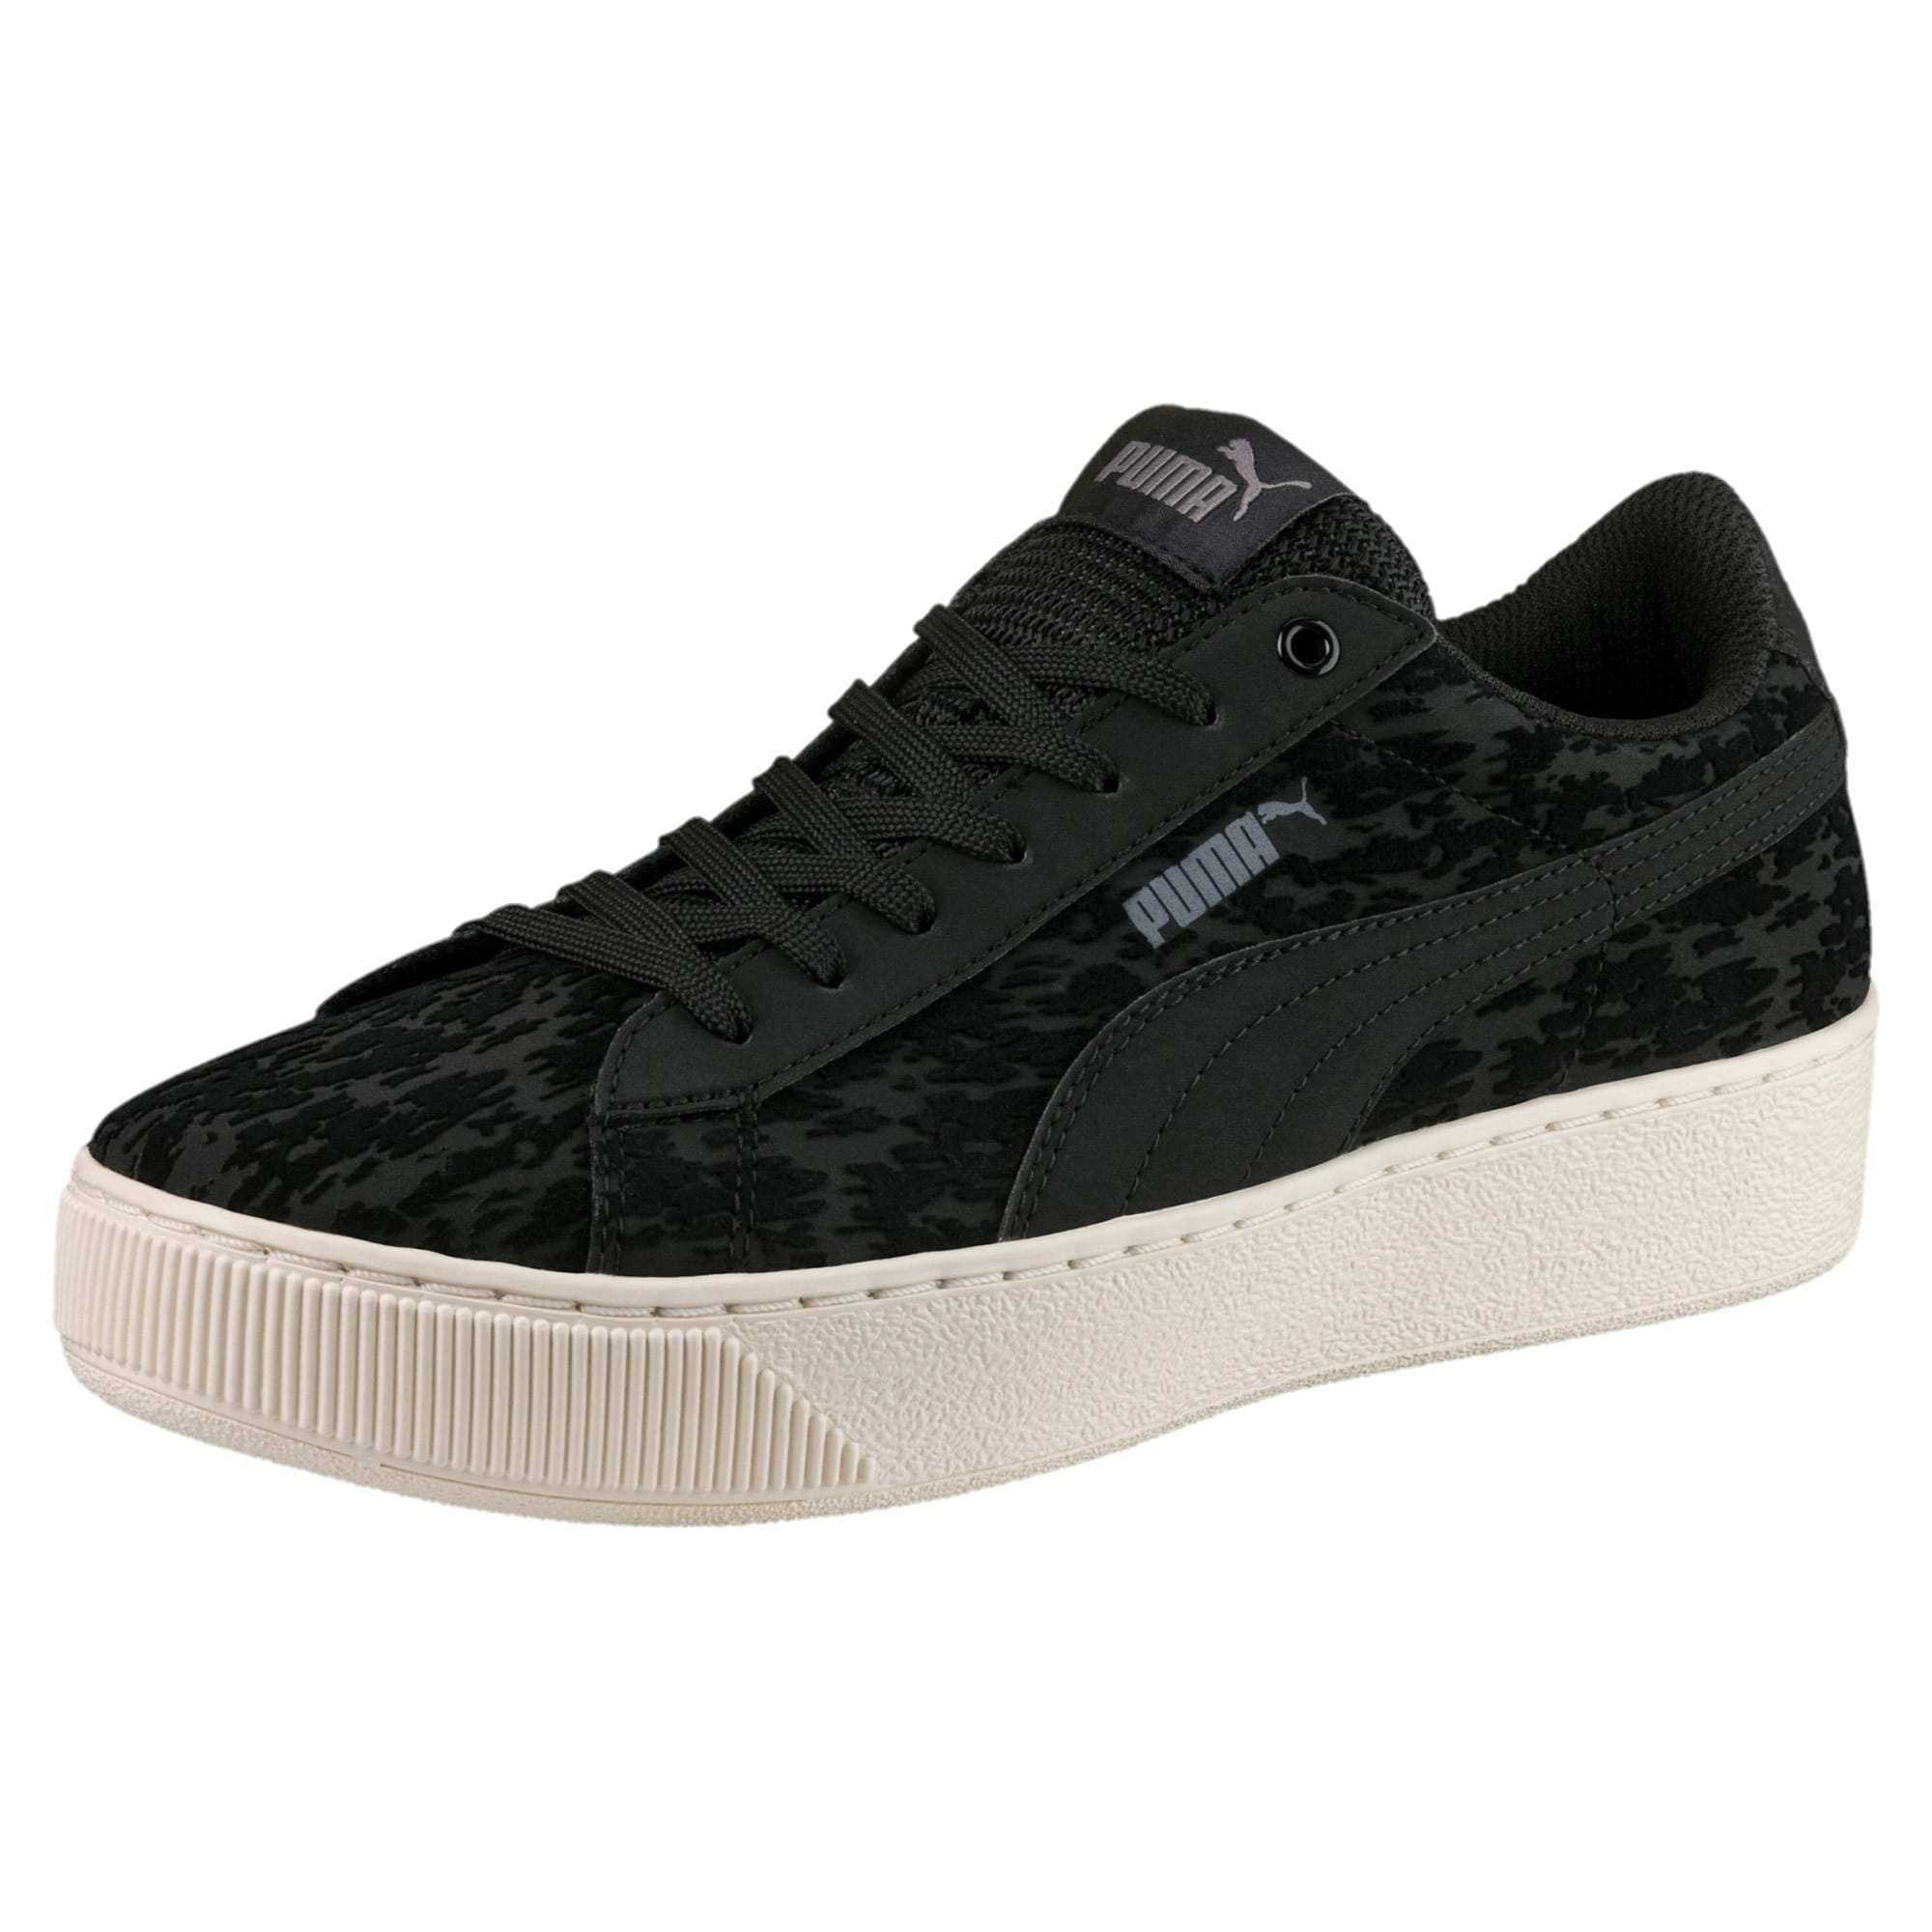 Thumbnail 1 of Vikky Platform Velvet Rope Women's Sneakers, Puma Black-Puma Black, medium